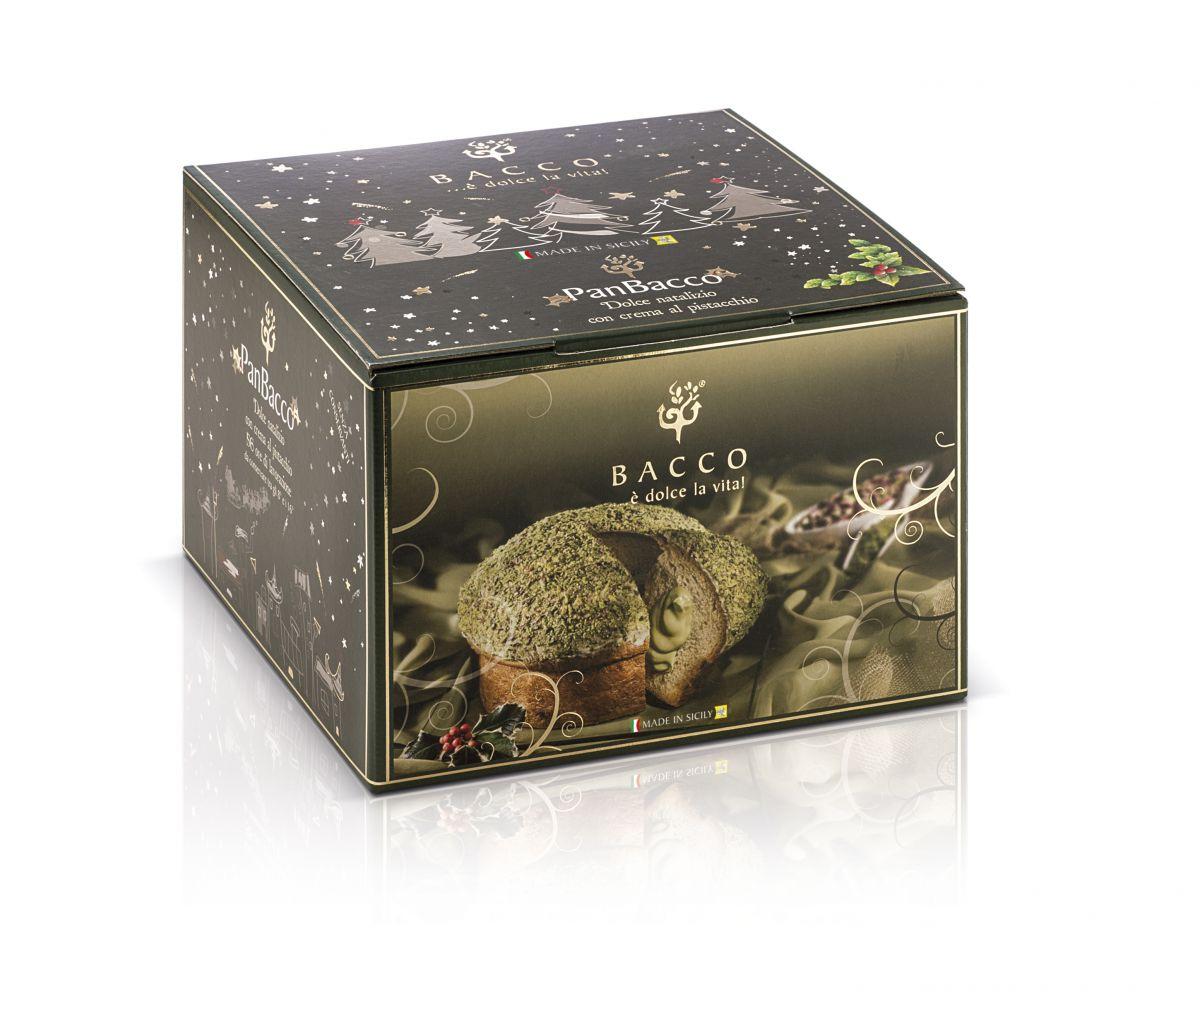 Bacco Panettone Panbacco stuffed with pistachio BCC01 Bacco